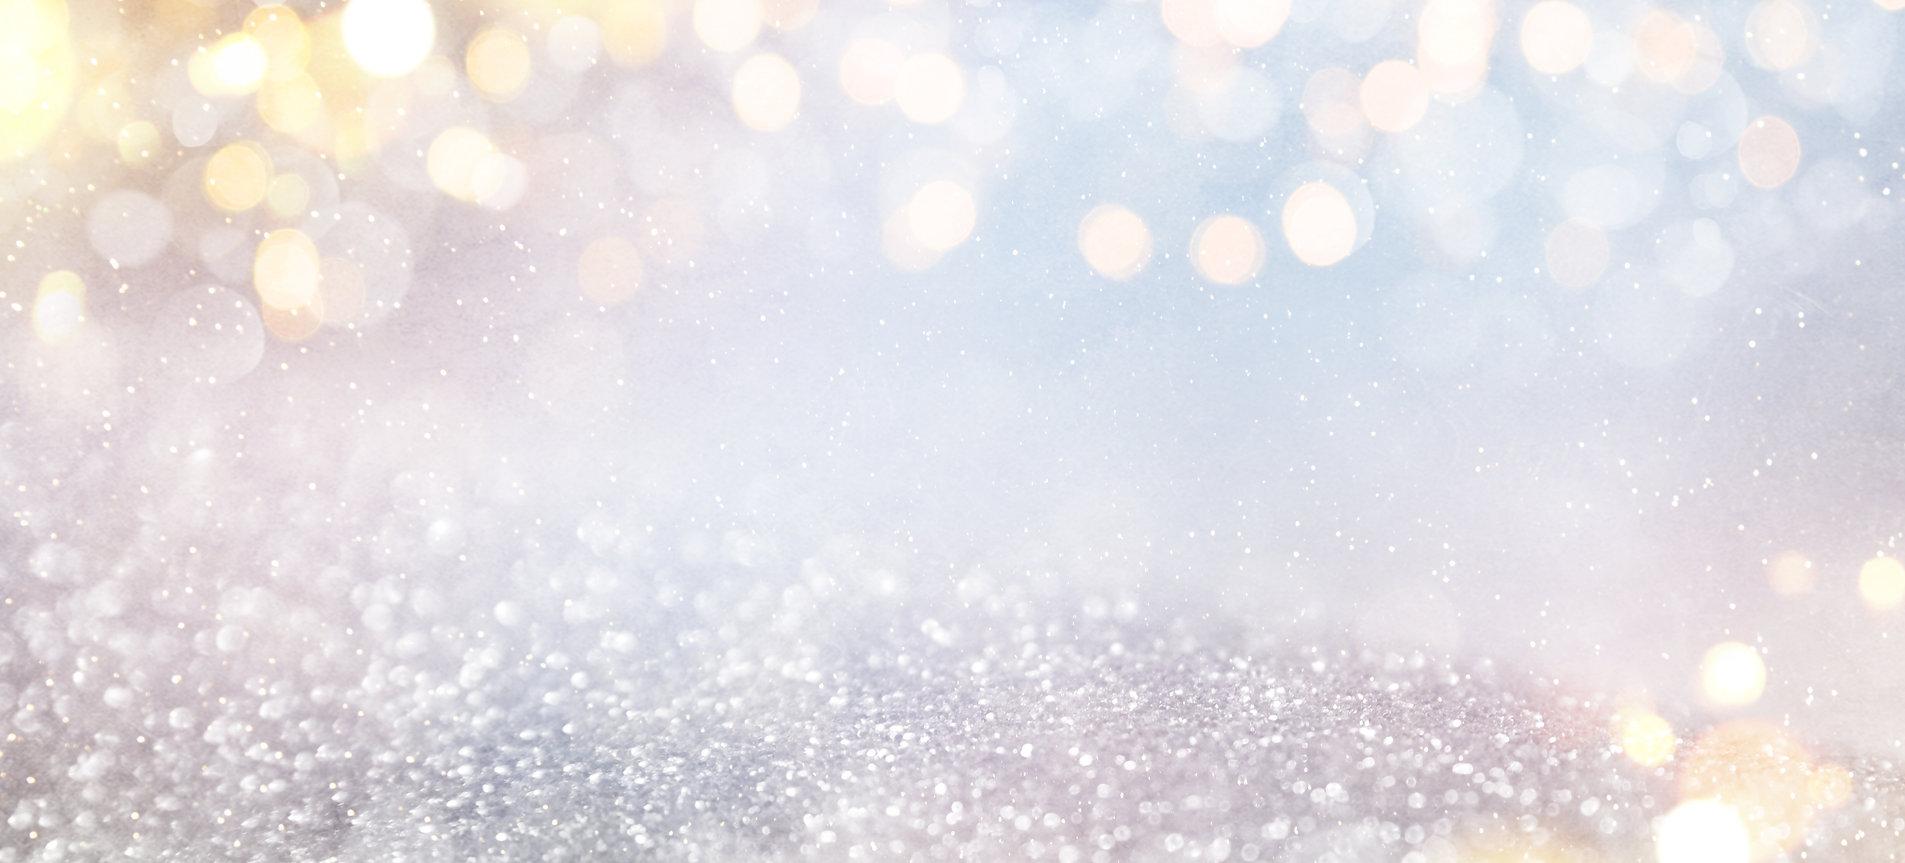 Christmas Background.jpg